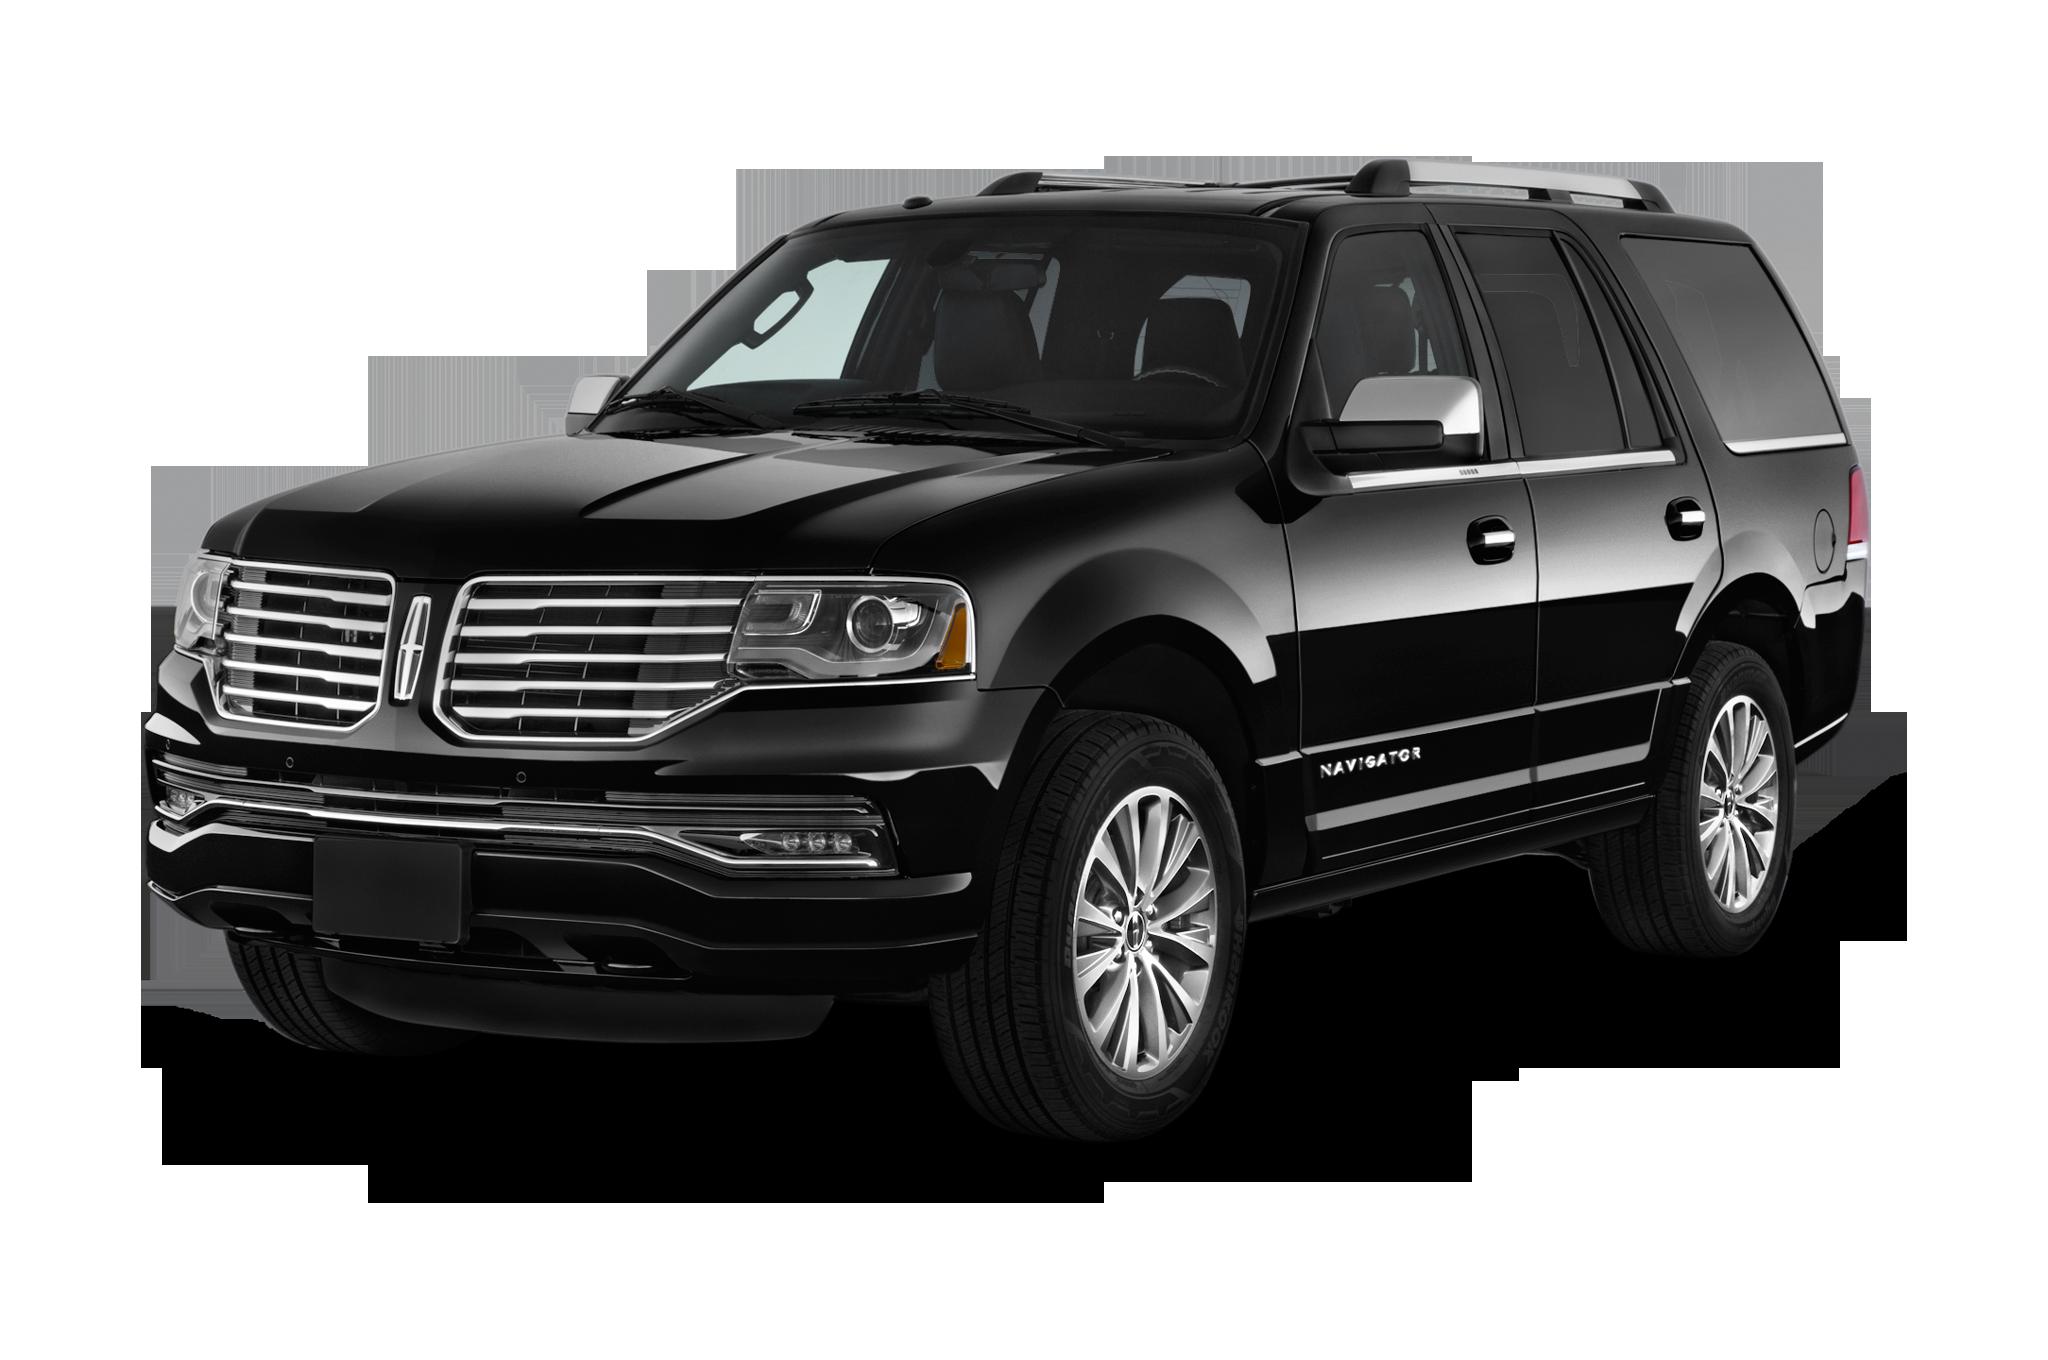 Lincoln Navigator Luxury SUV